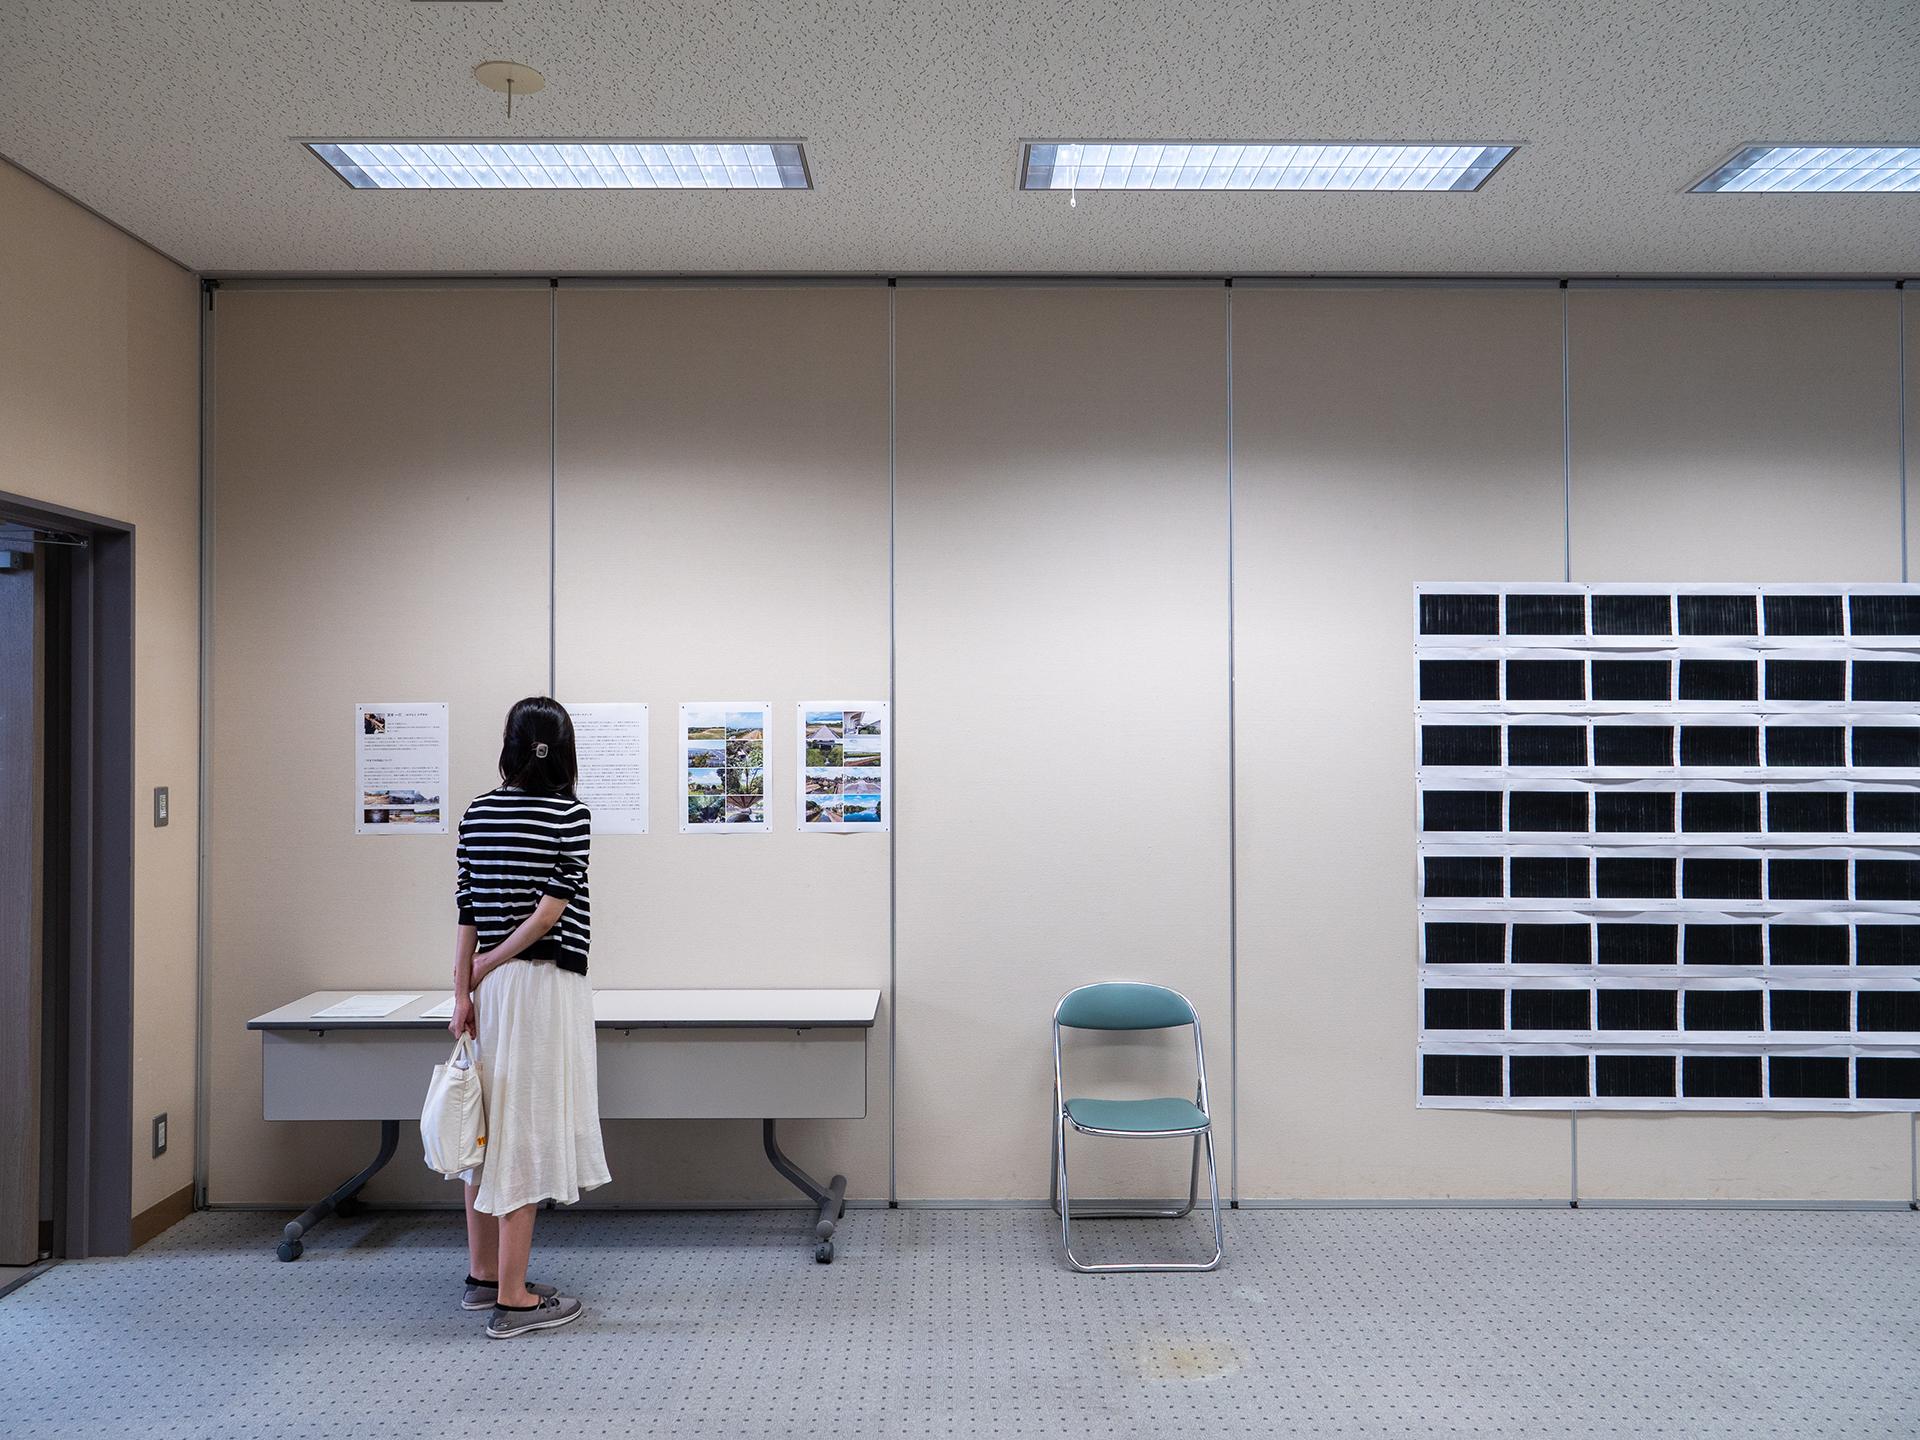 Kyoto: Re-Search 2020 in Yawata